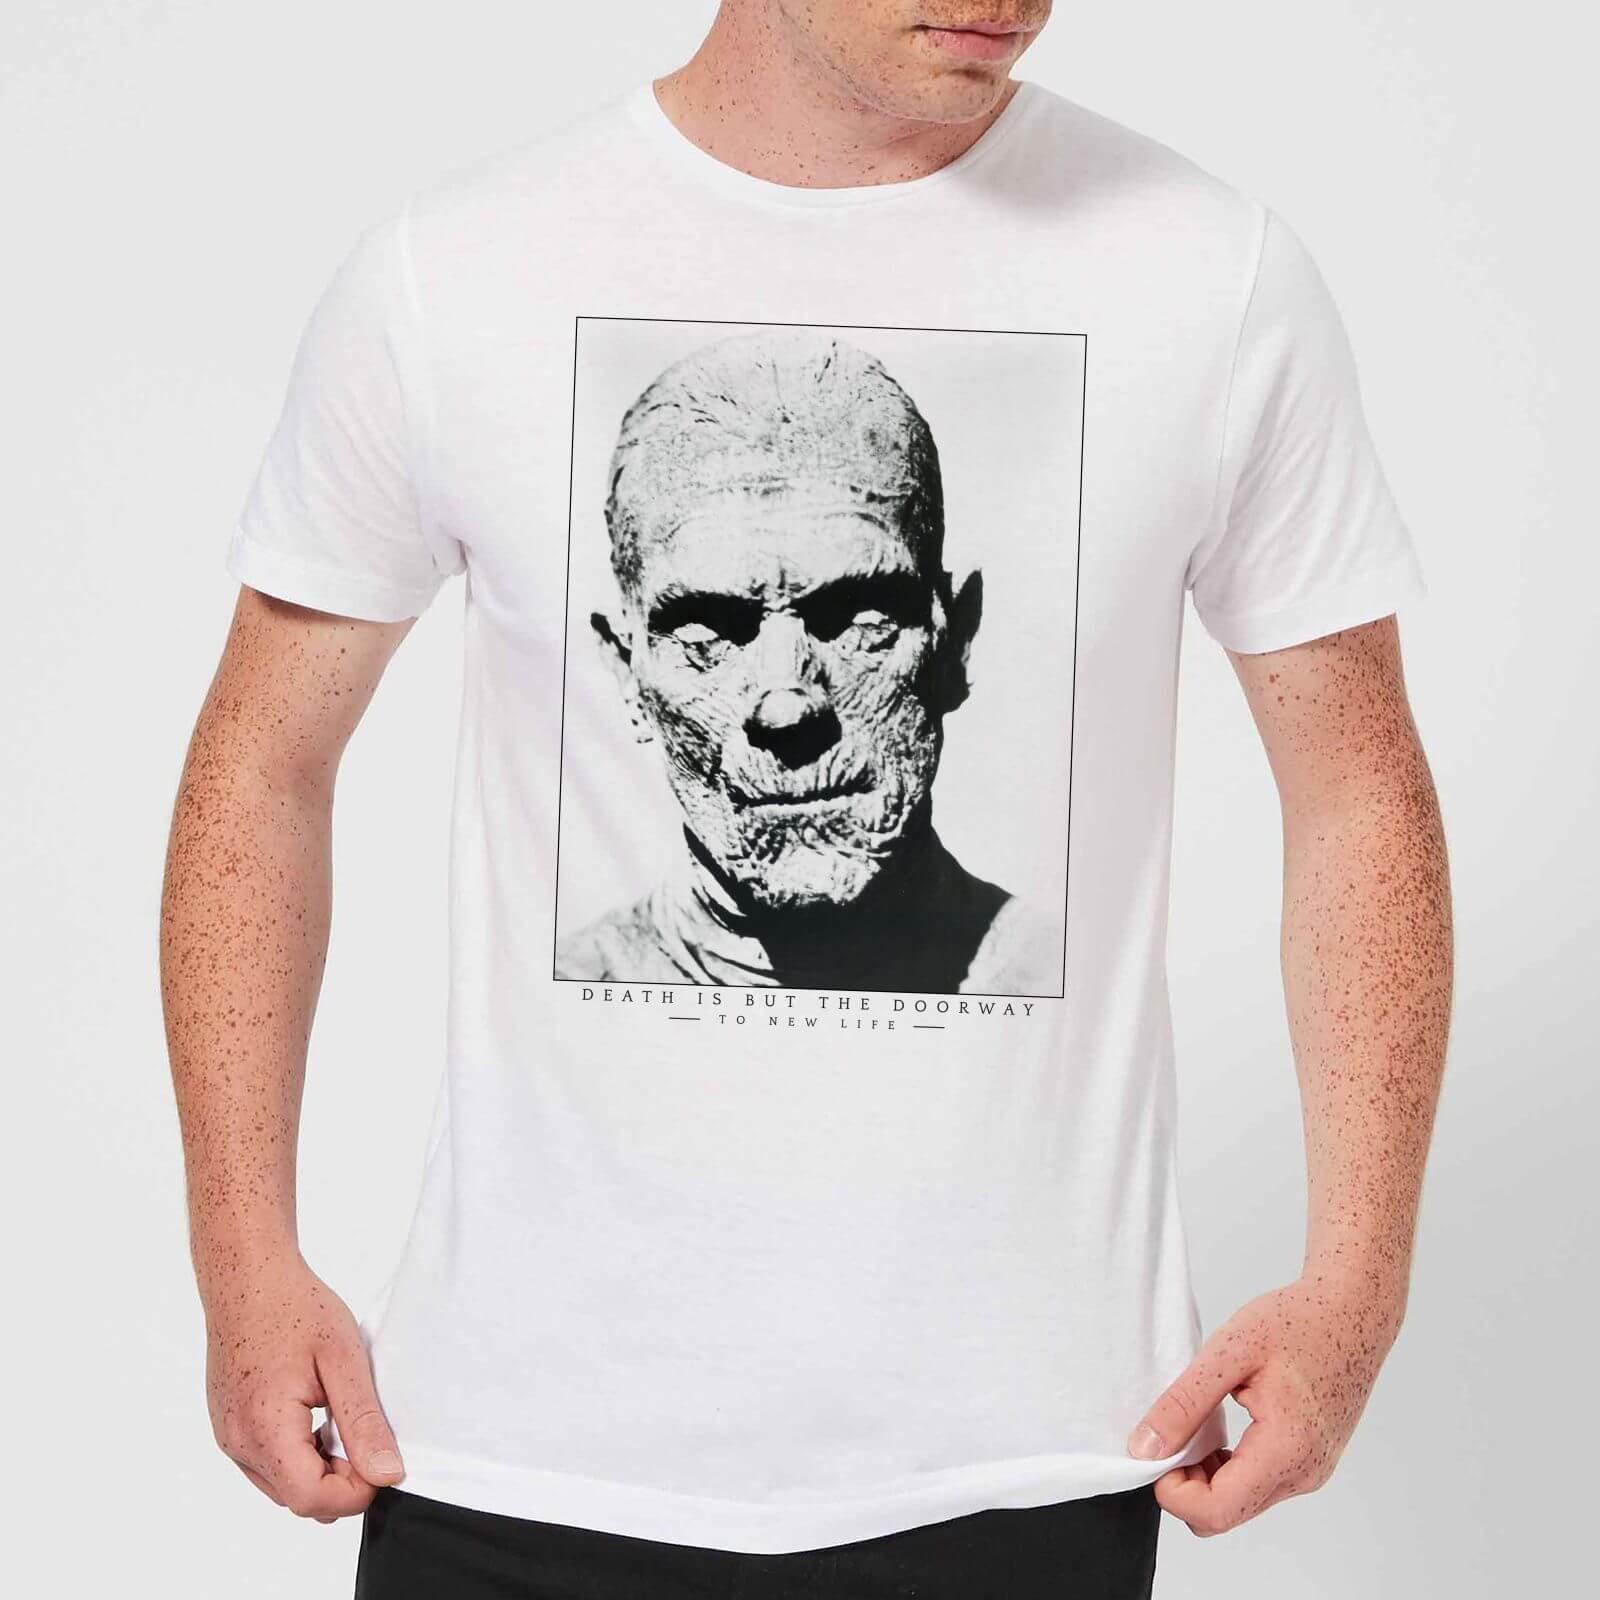 Universal Monsters The Mummy Portrait Men's T-Shirt - White - S - White